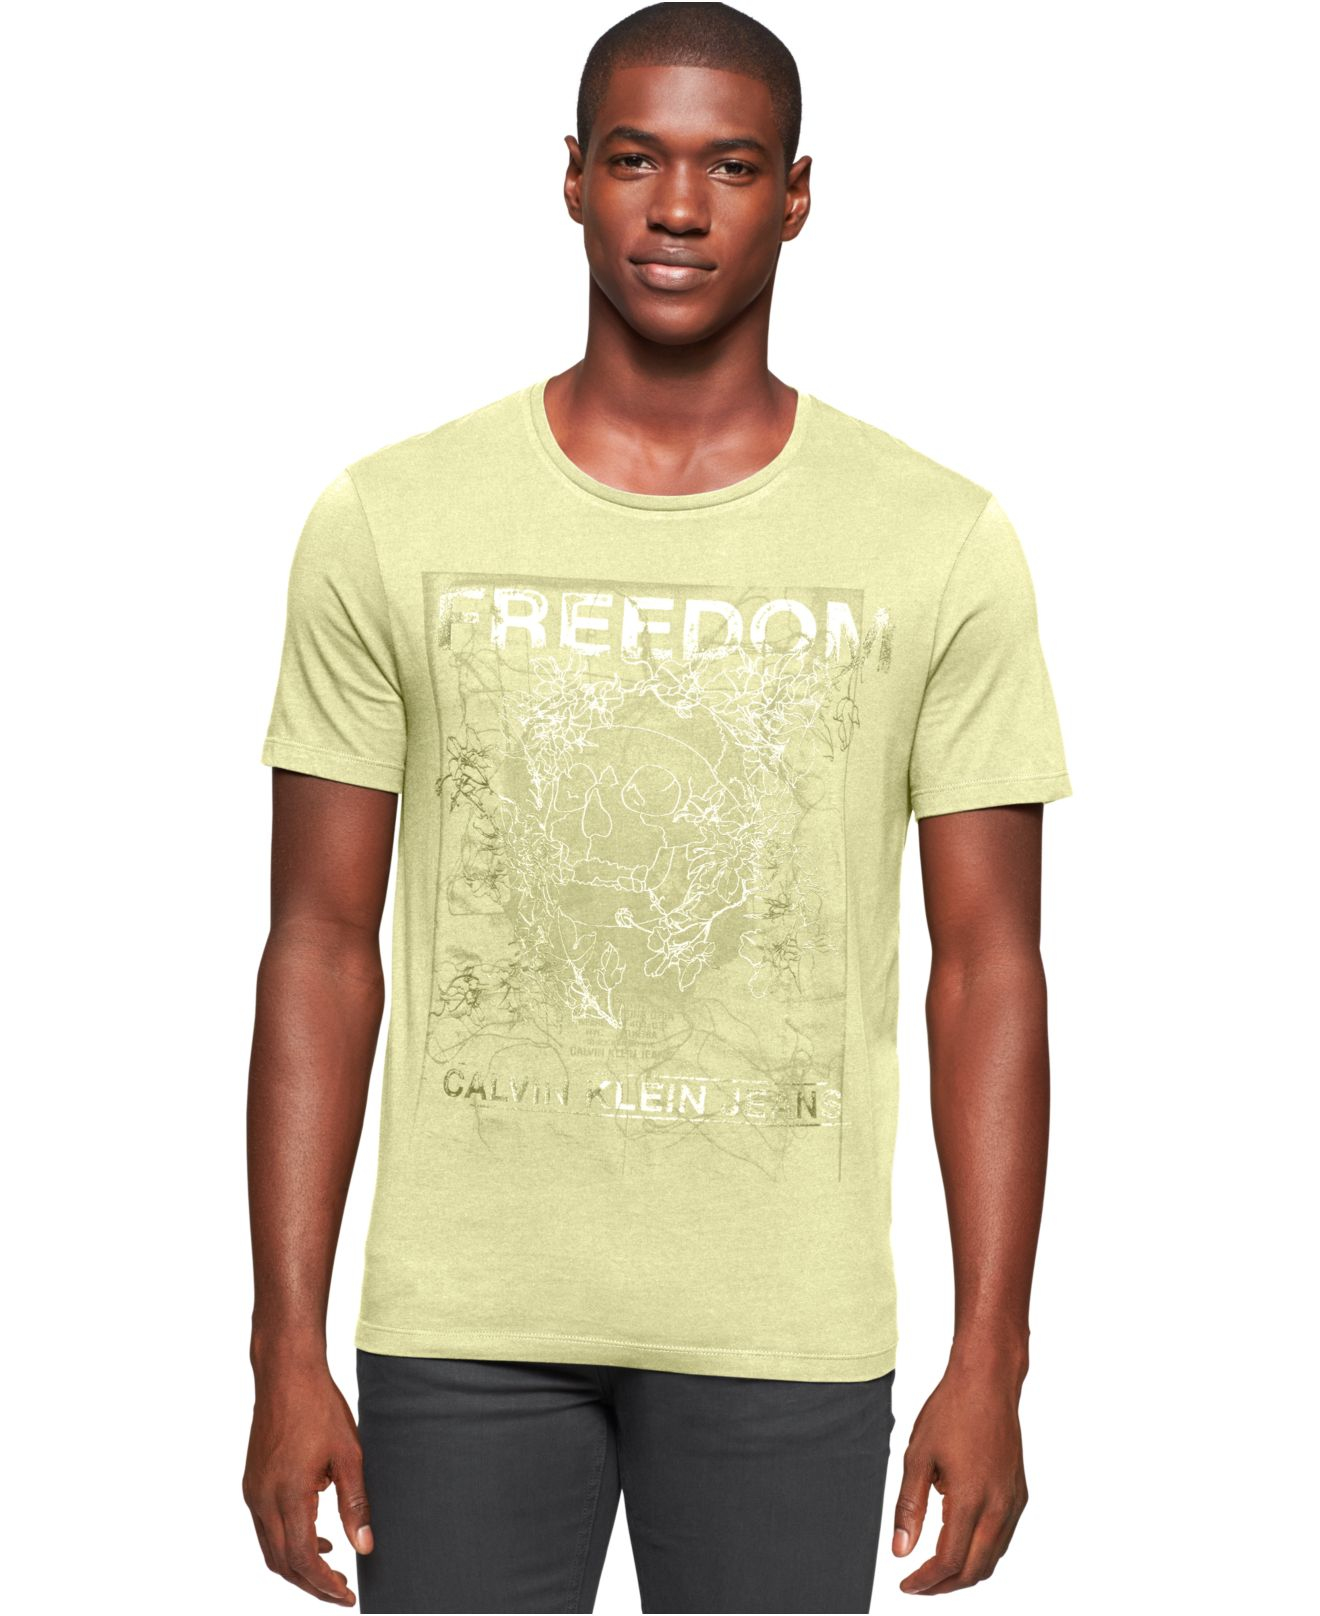 calvin klein jeans ck freedom graphic print logo t shirt. Black Bedroom Furniture Sets. Home Design Ideas